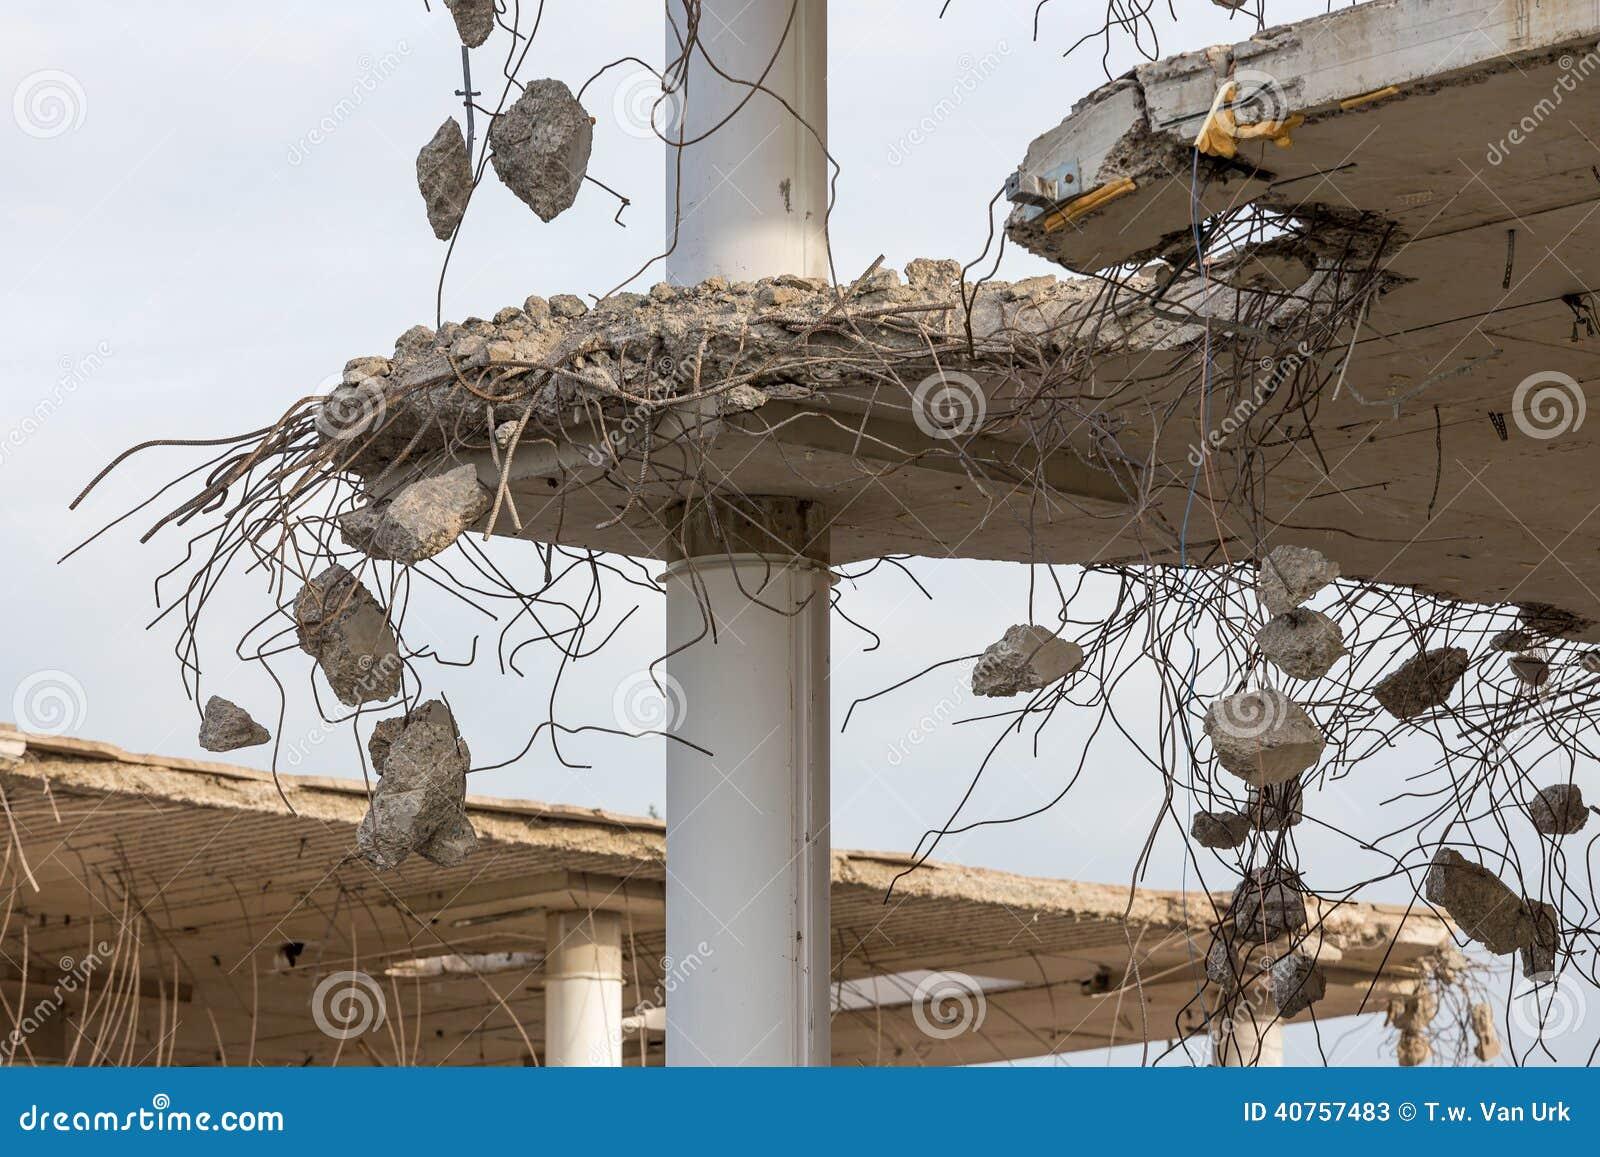 Demolition of a concrete building stock image image for Floor pillars